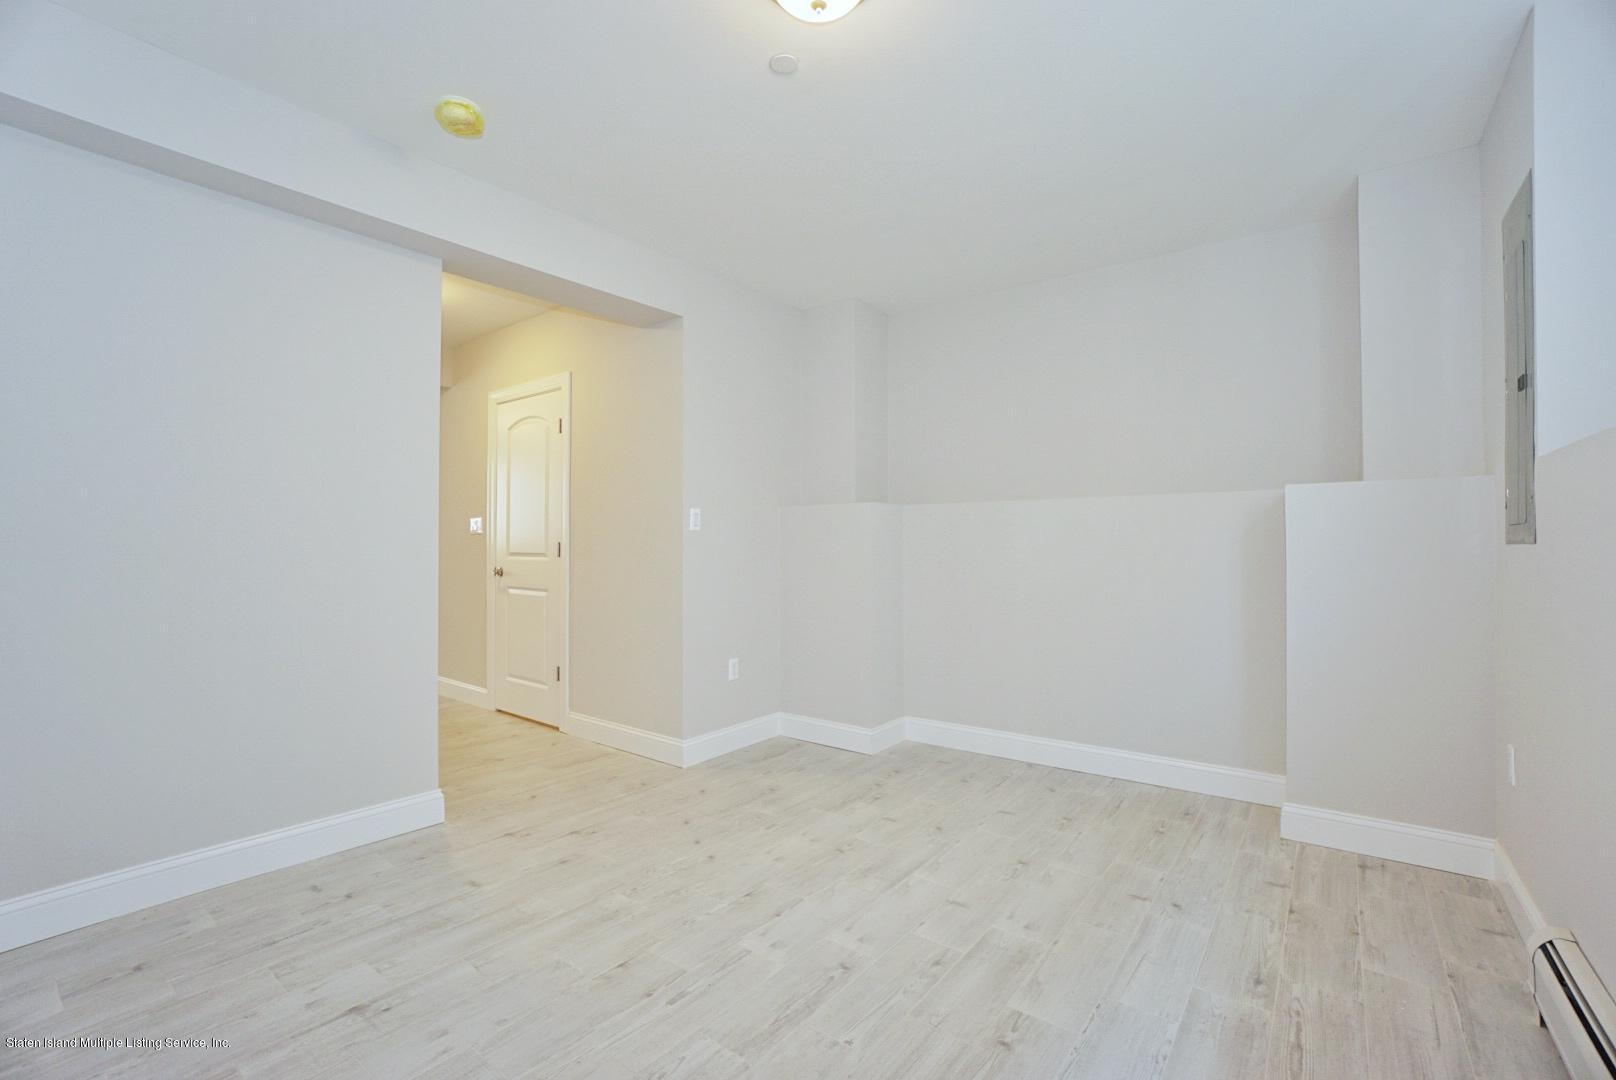 Single Family - Detached 170 Fairview Avenue  Staten Island, NY 10314, MLS-1126684-54